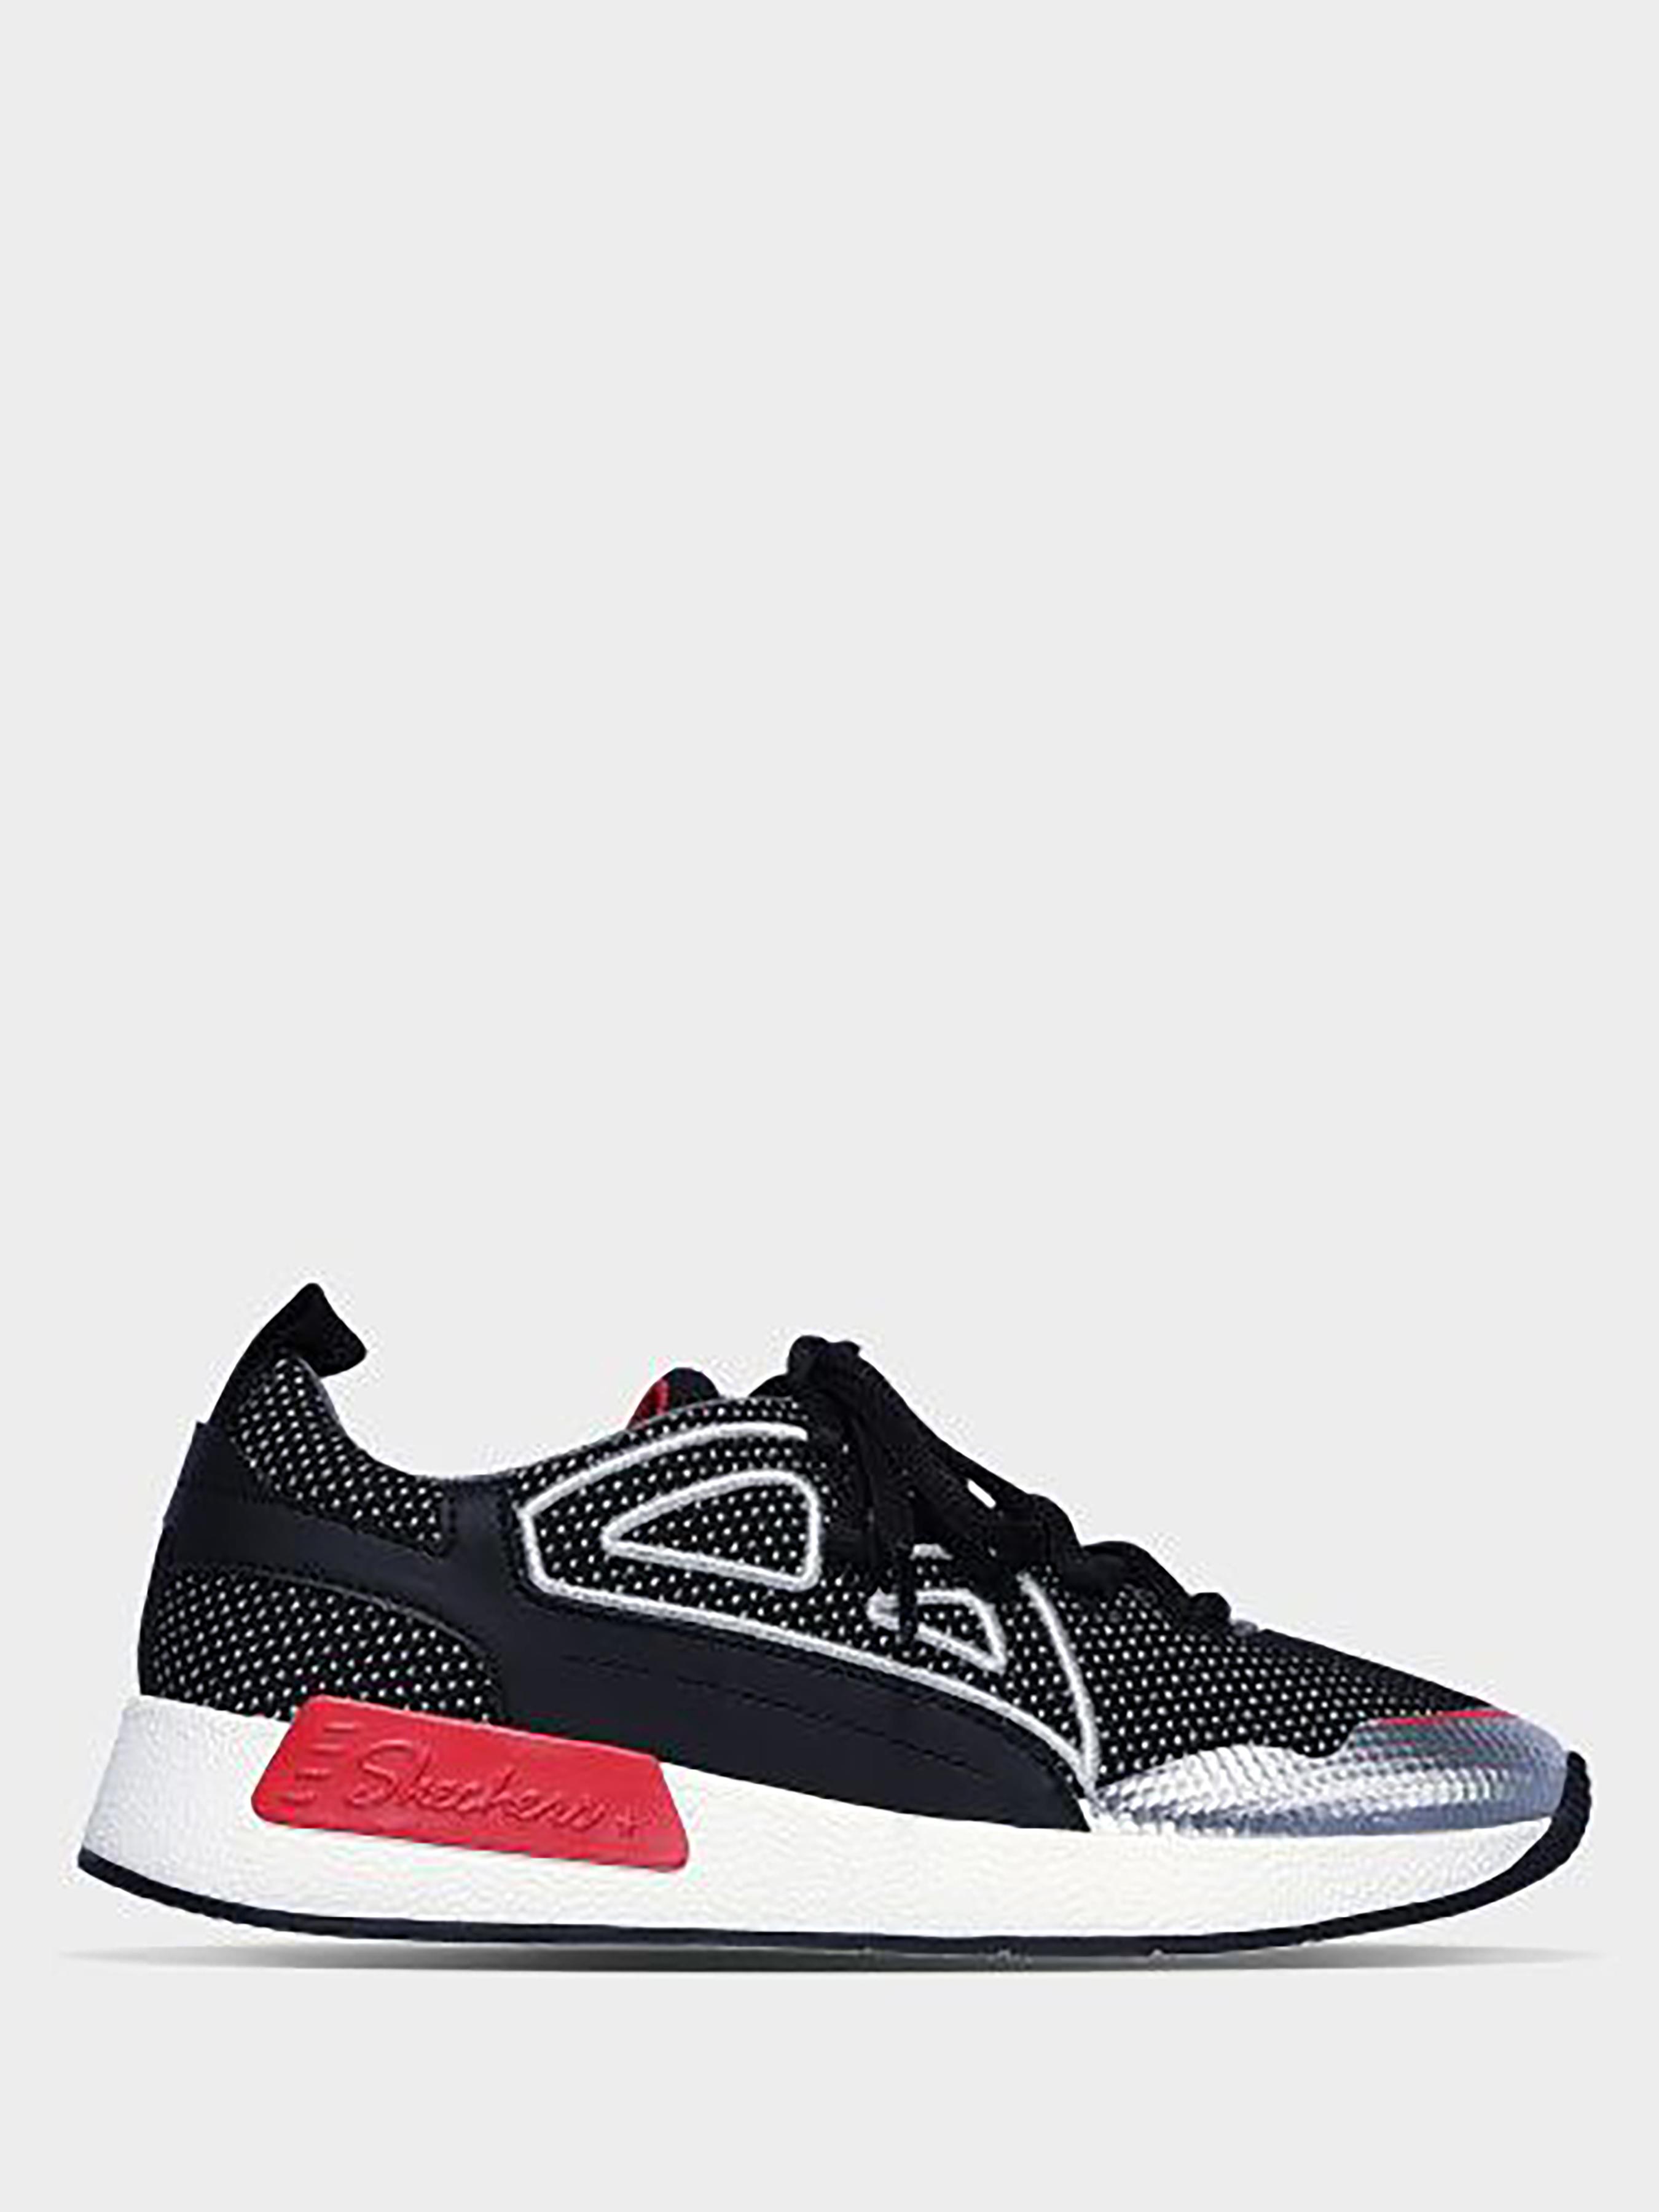 Кроссовки для женщин Skechers KW5188 продажа, 2017